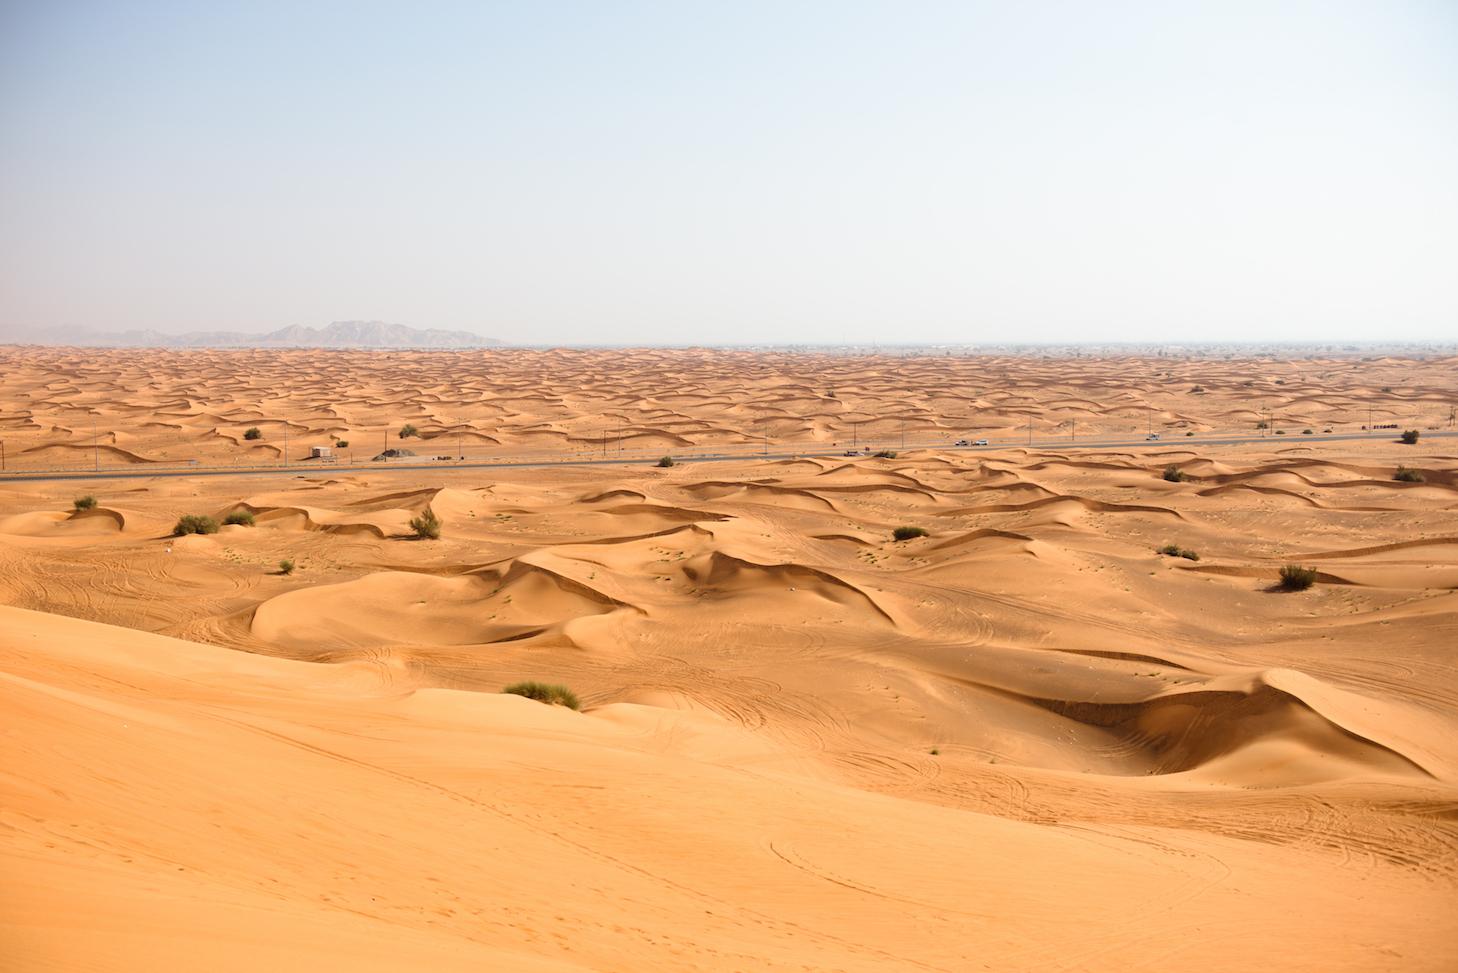 Selling Sand in the Arabian Peninsula